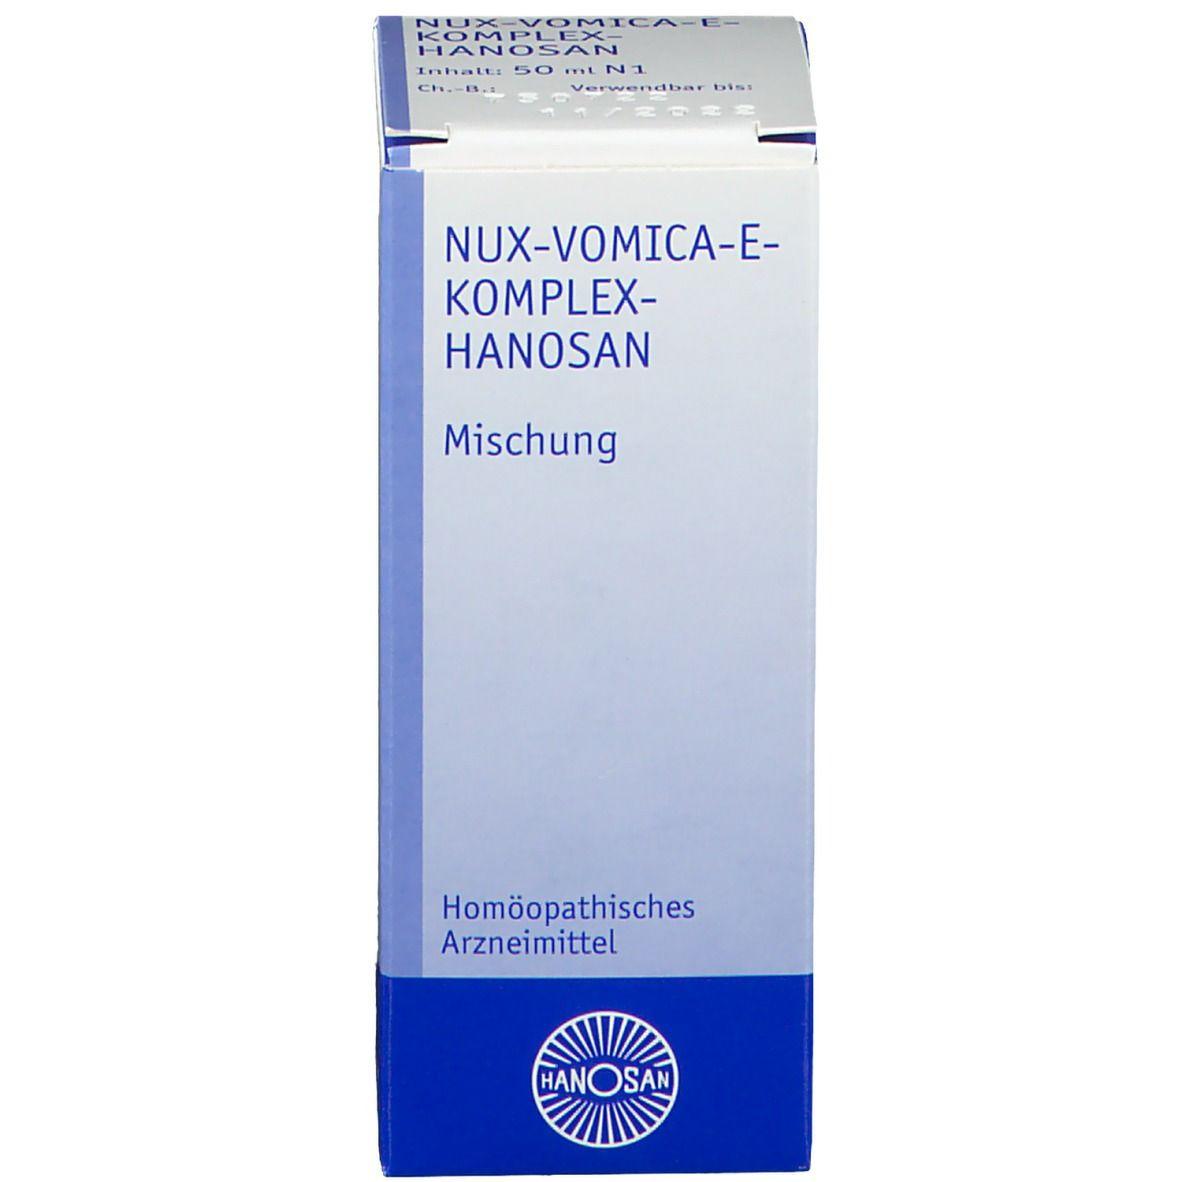 NUX VOMICA-E-KOMPLEX HANOSAN